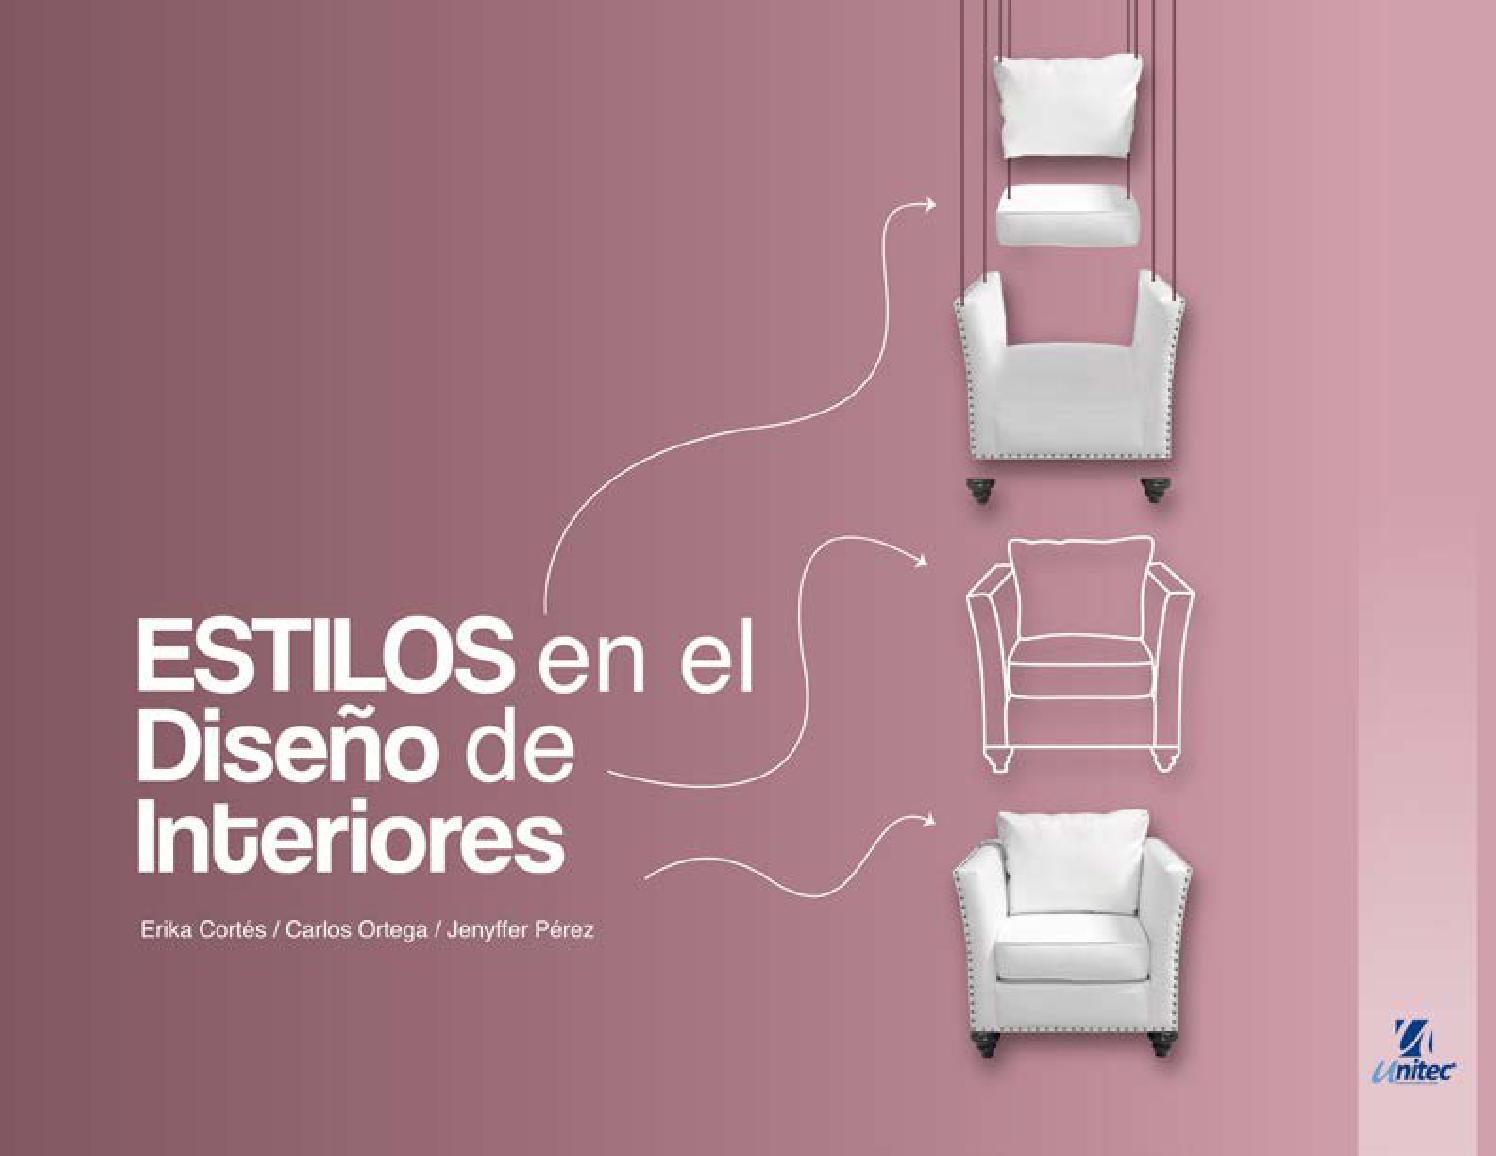 Diseño de Interiores Clasico by Jenyffer Pérez M - issuu